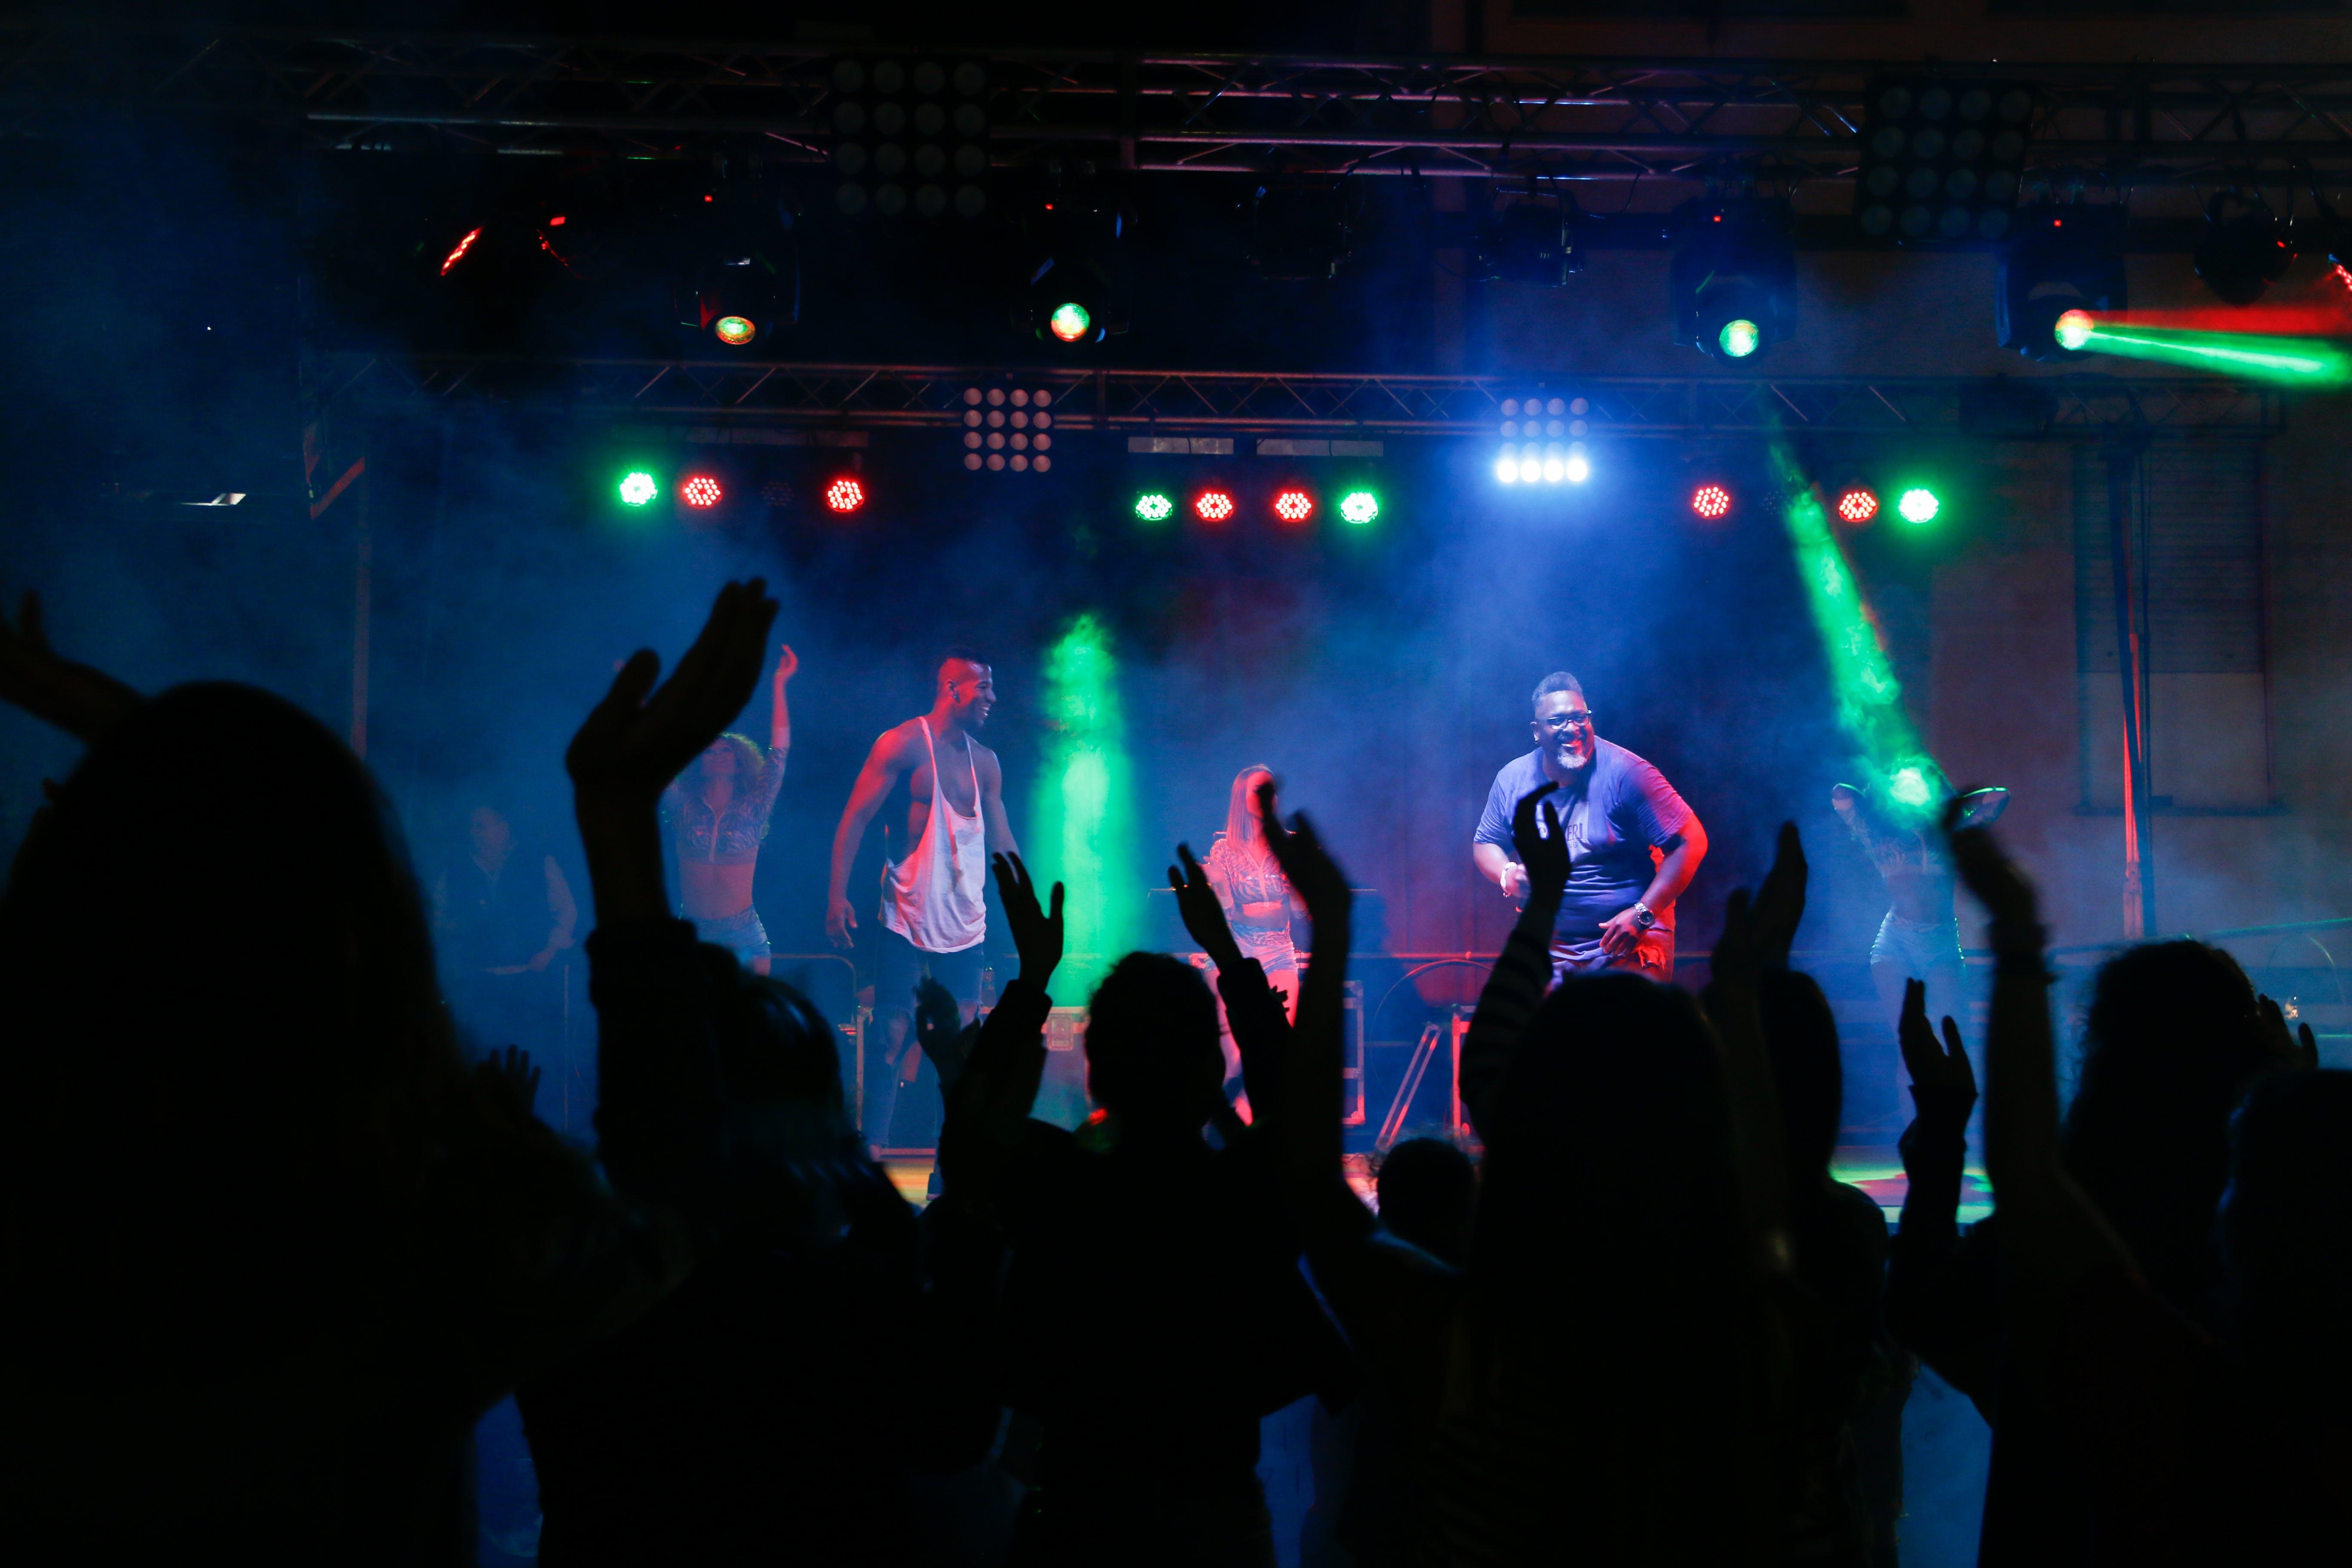 Kostnadsfri bild av band, fest, folkmassa, konsert